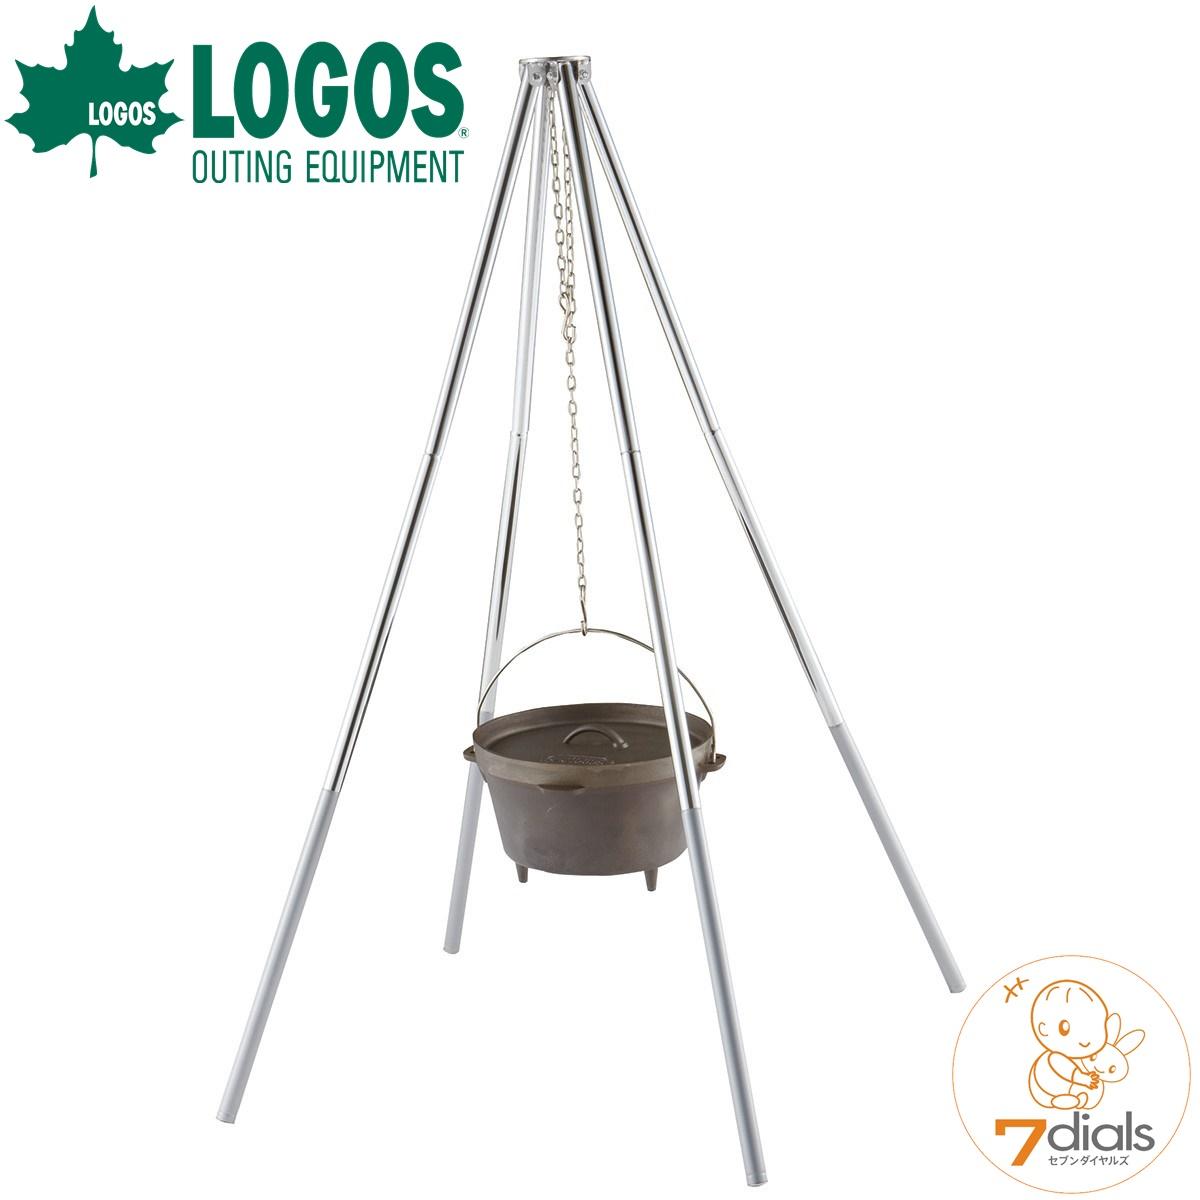 LOGOS/ロゴス クワトロポッド ダッチオーブンの調理に最適な安定した4脚のクワトロポッド コンパクト収納 専用収納バッグ付属 【送料無料】